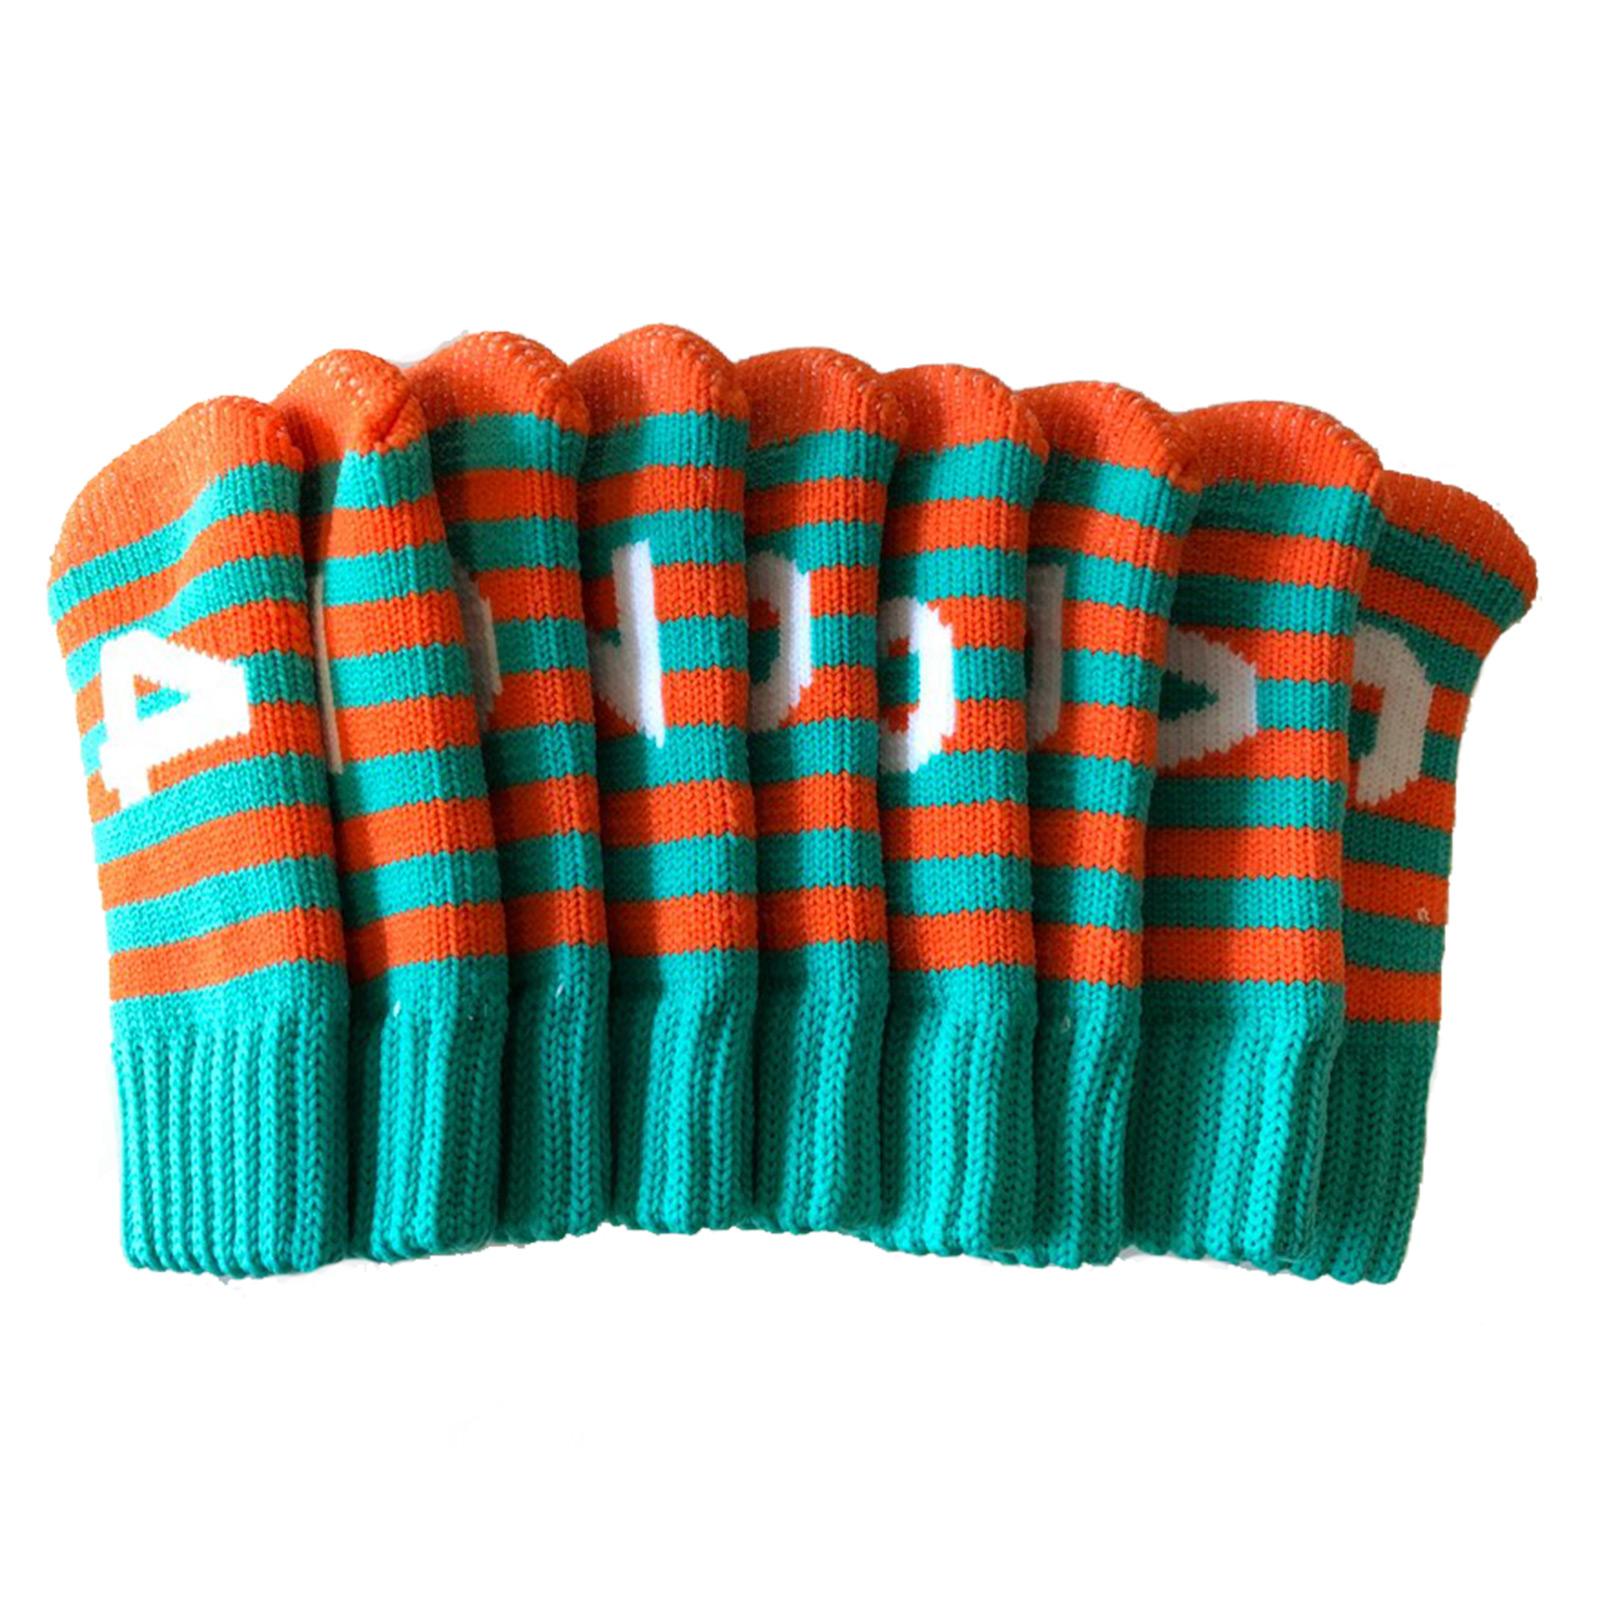 Iron Golf Knit Headcovers Knitted Head Cover Socks Green Orange New Ebay